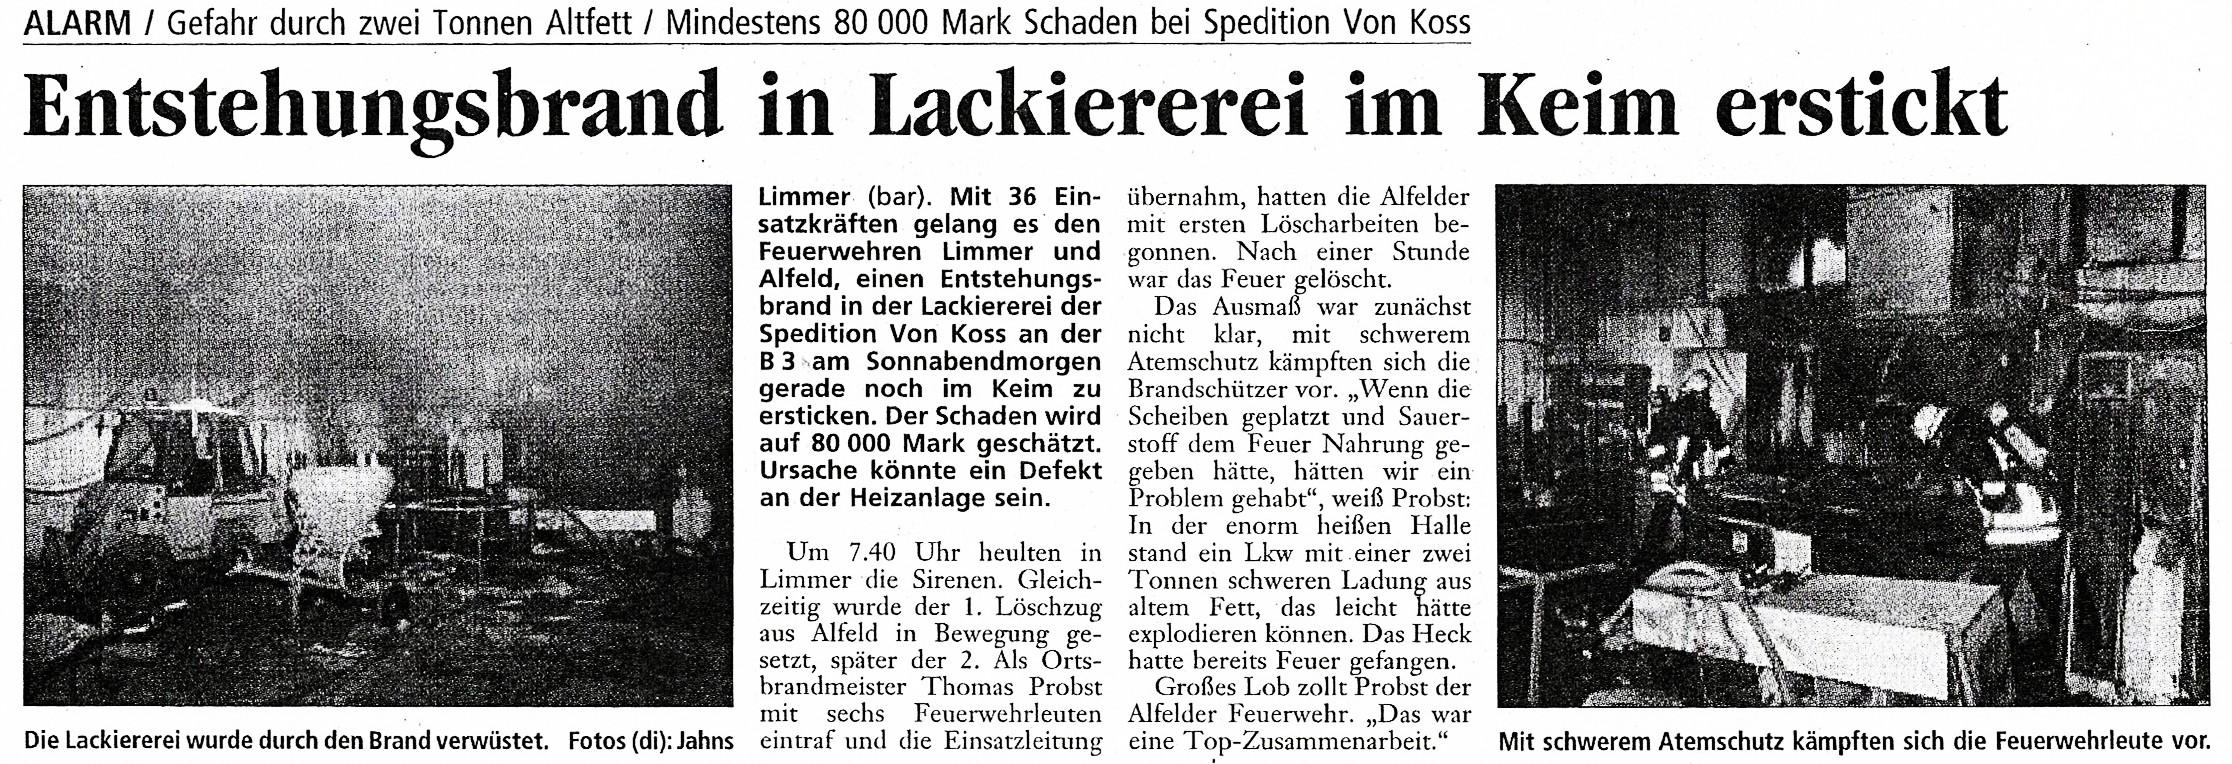 2001-01-29 Entstehungsbrand in Lackiererei